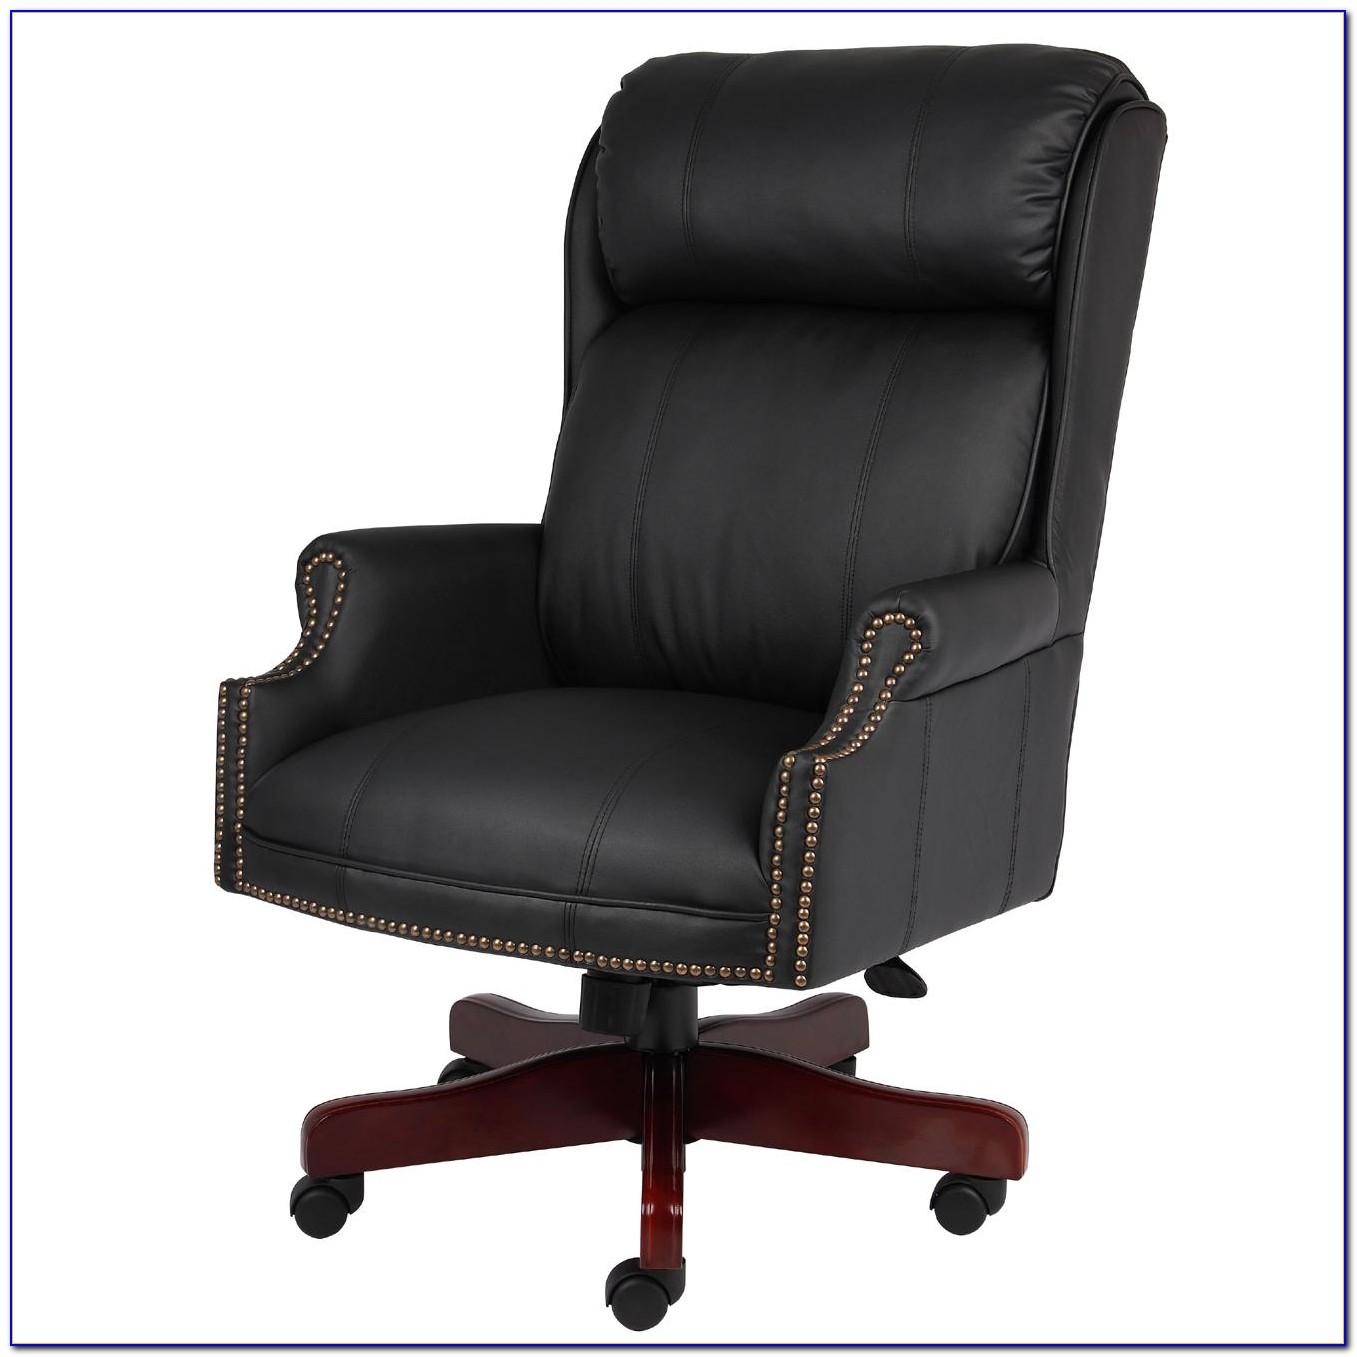 Broyhill Executive Office Desk Chair